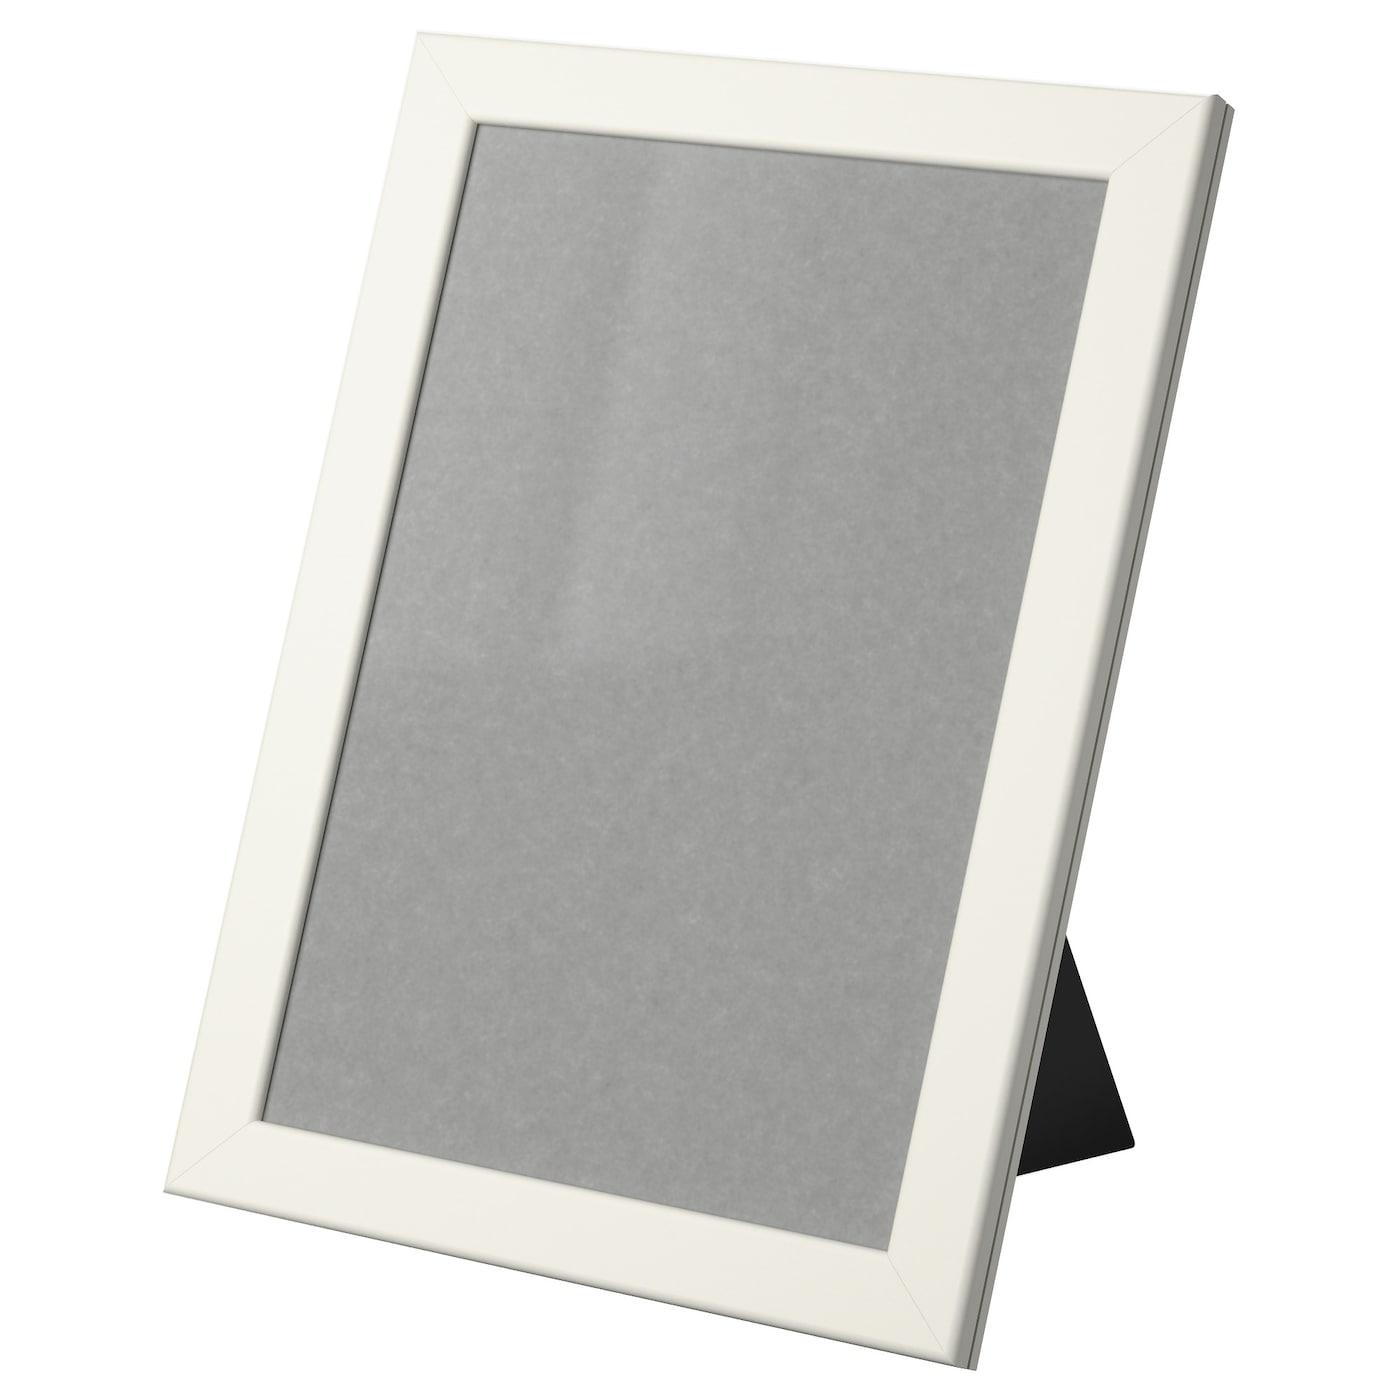 hemmingsbo cadre ouverture avant blanc 21 x 30 cm ikea. Black Bedroom Furniture Sets. Home Design Ideas